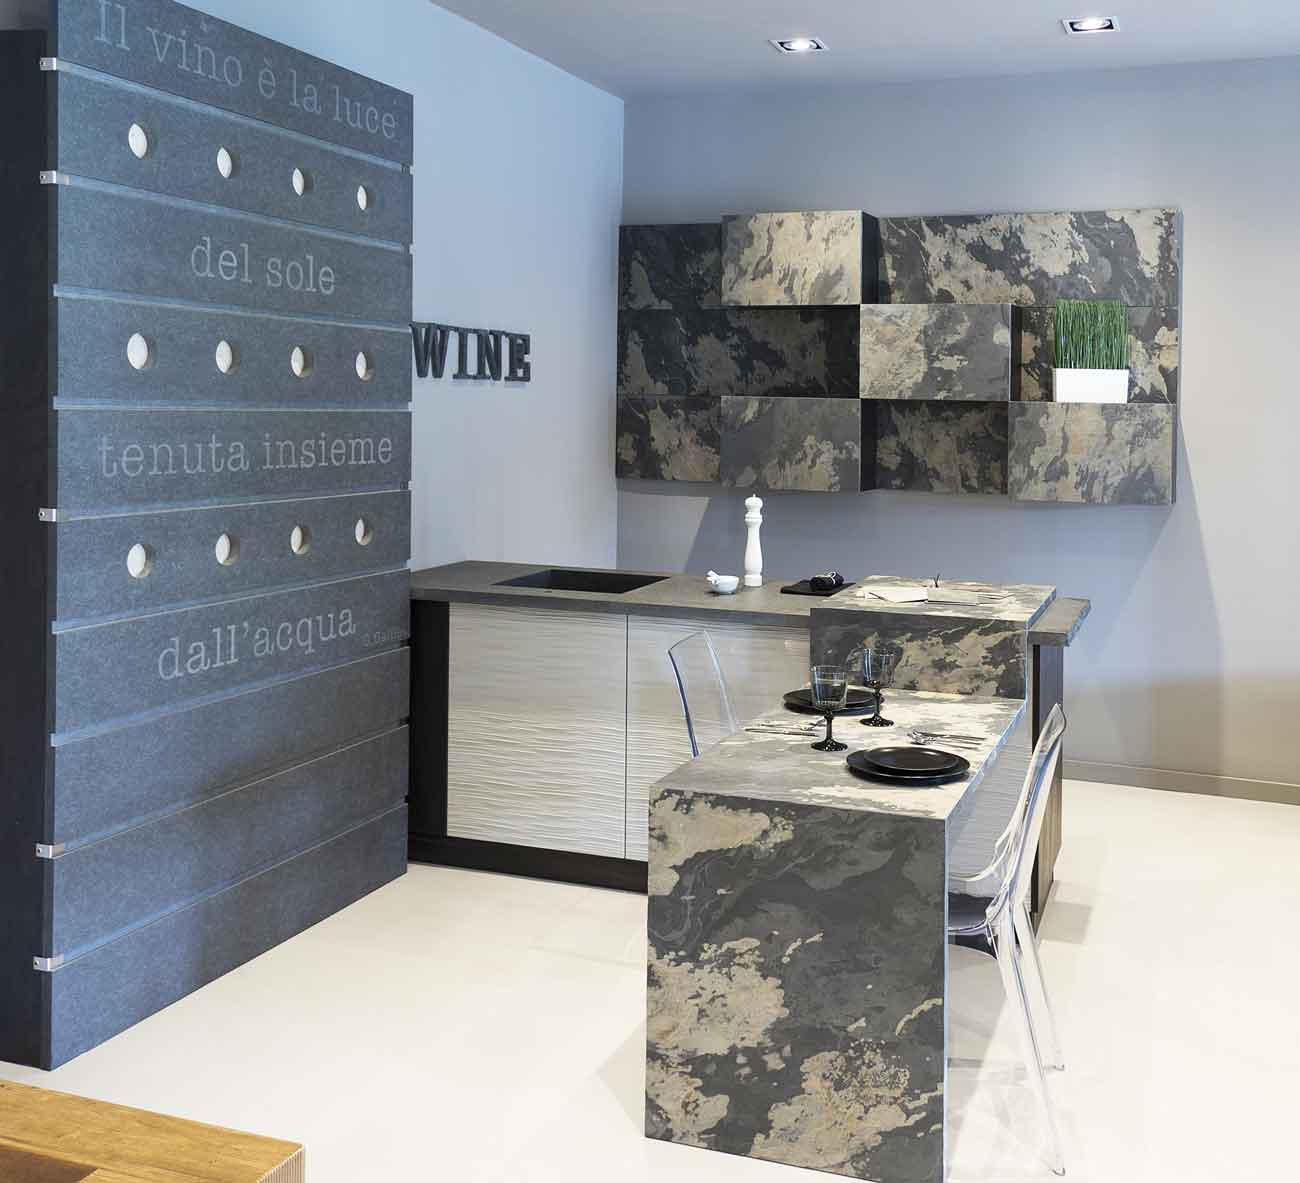 Naldi pavimenti, Showroom, Spazio idee